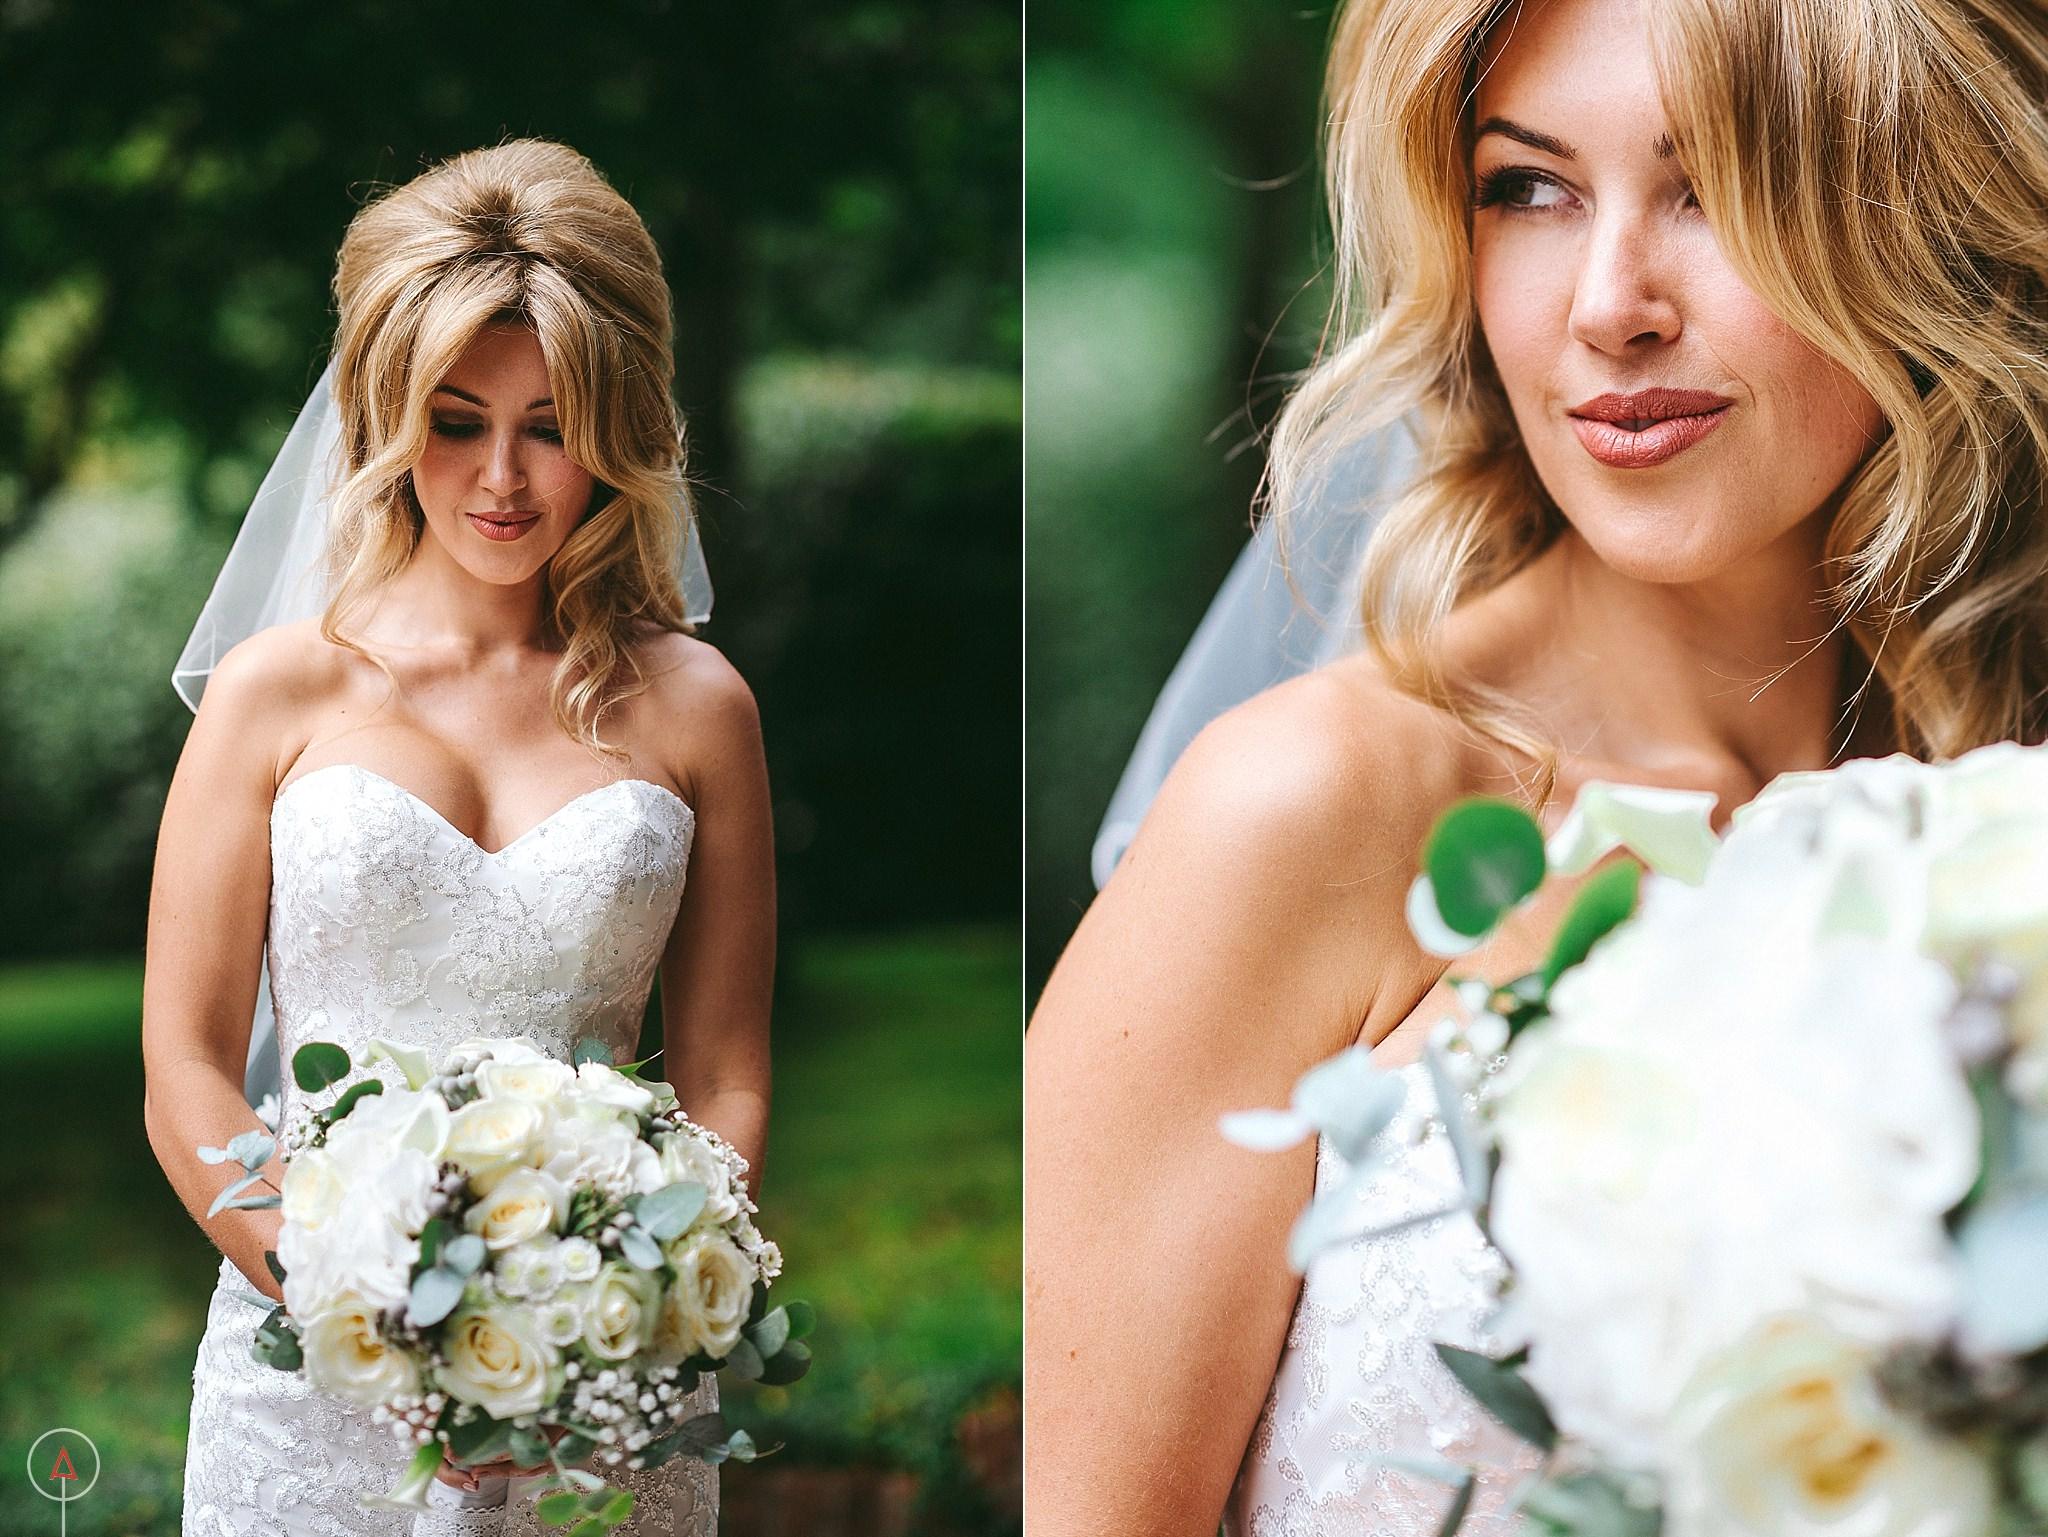 cardiff-wedding-photographer-aga-tomaszek_0316